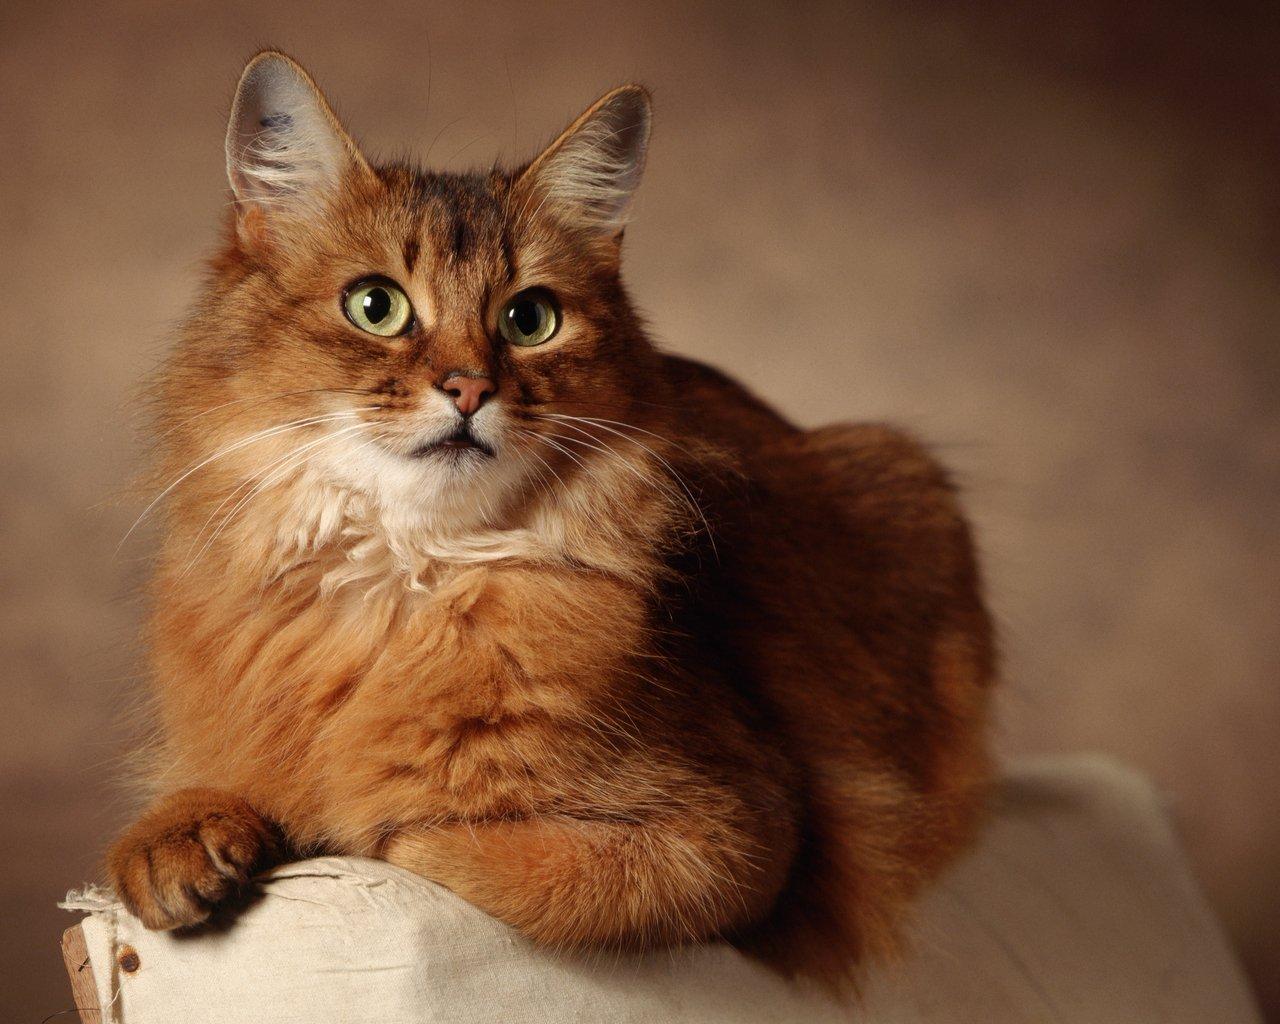 Кот похожий на лису